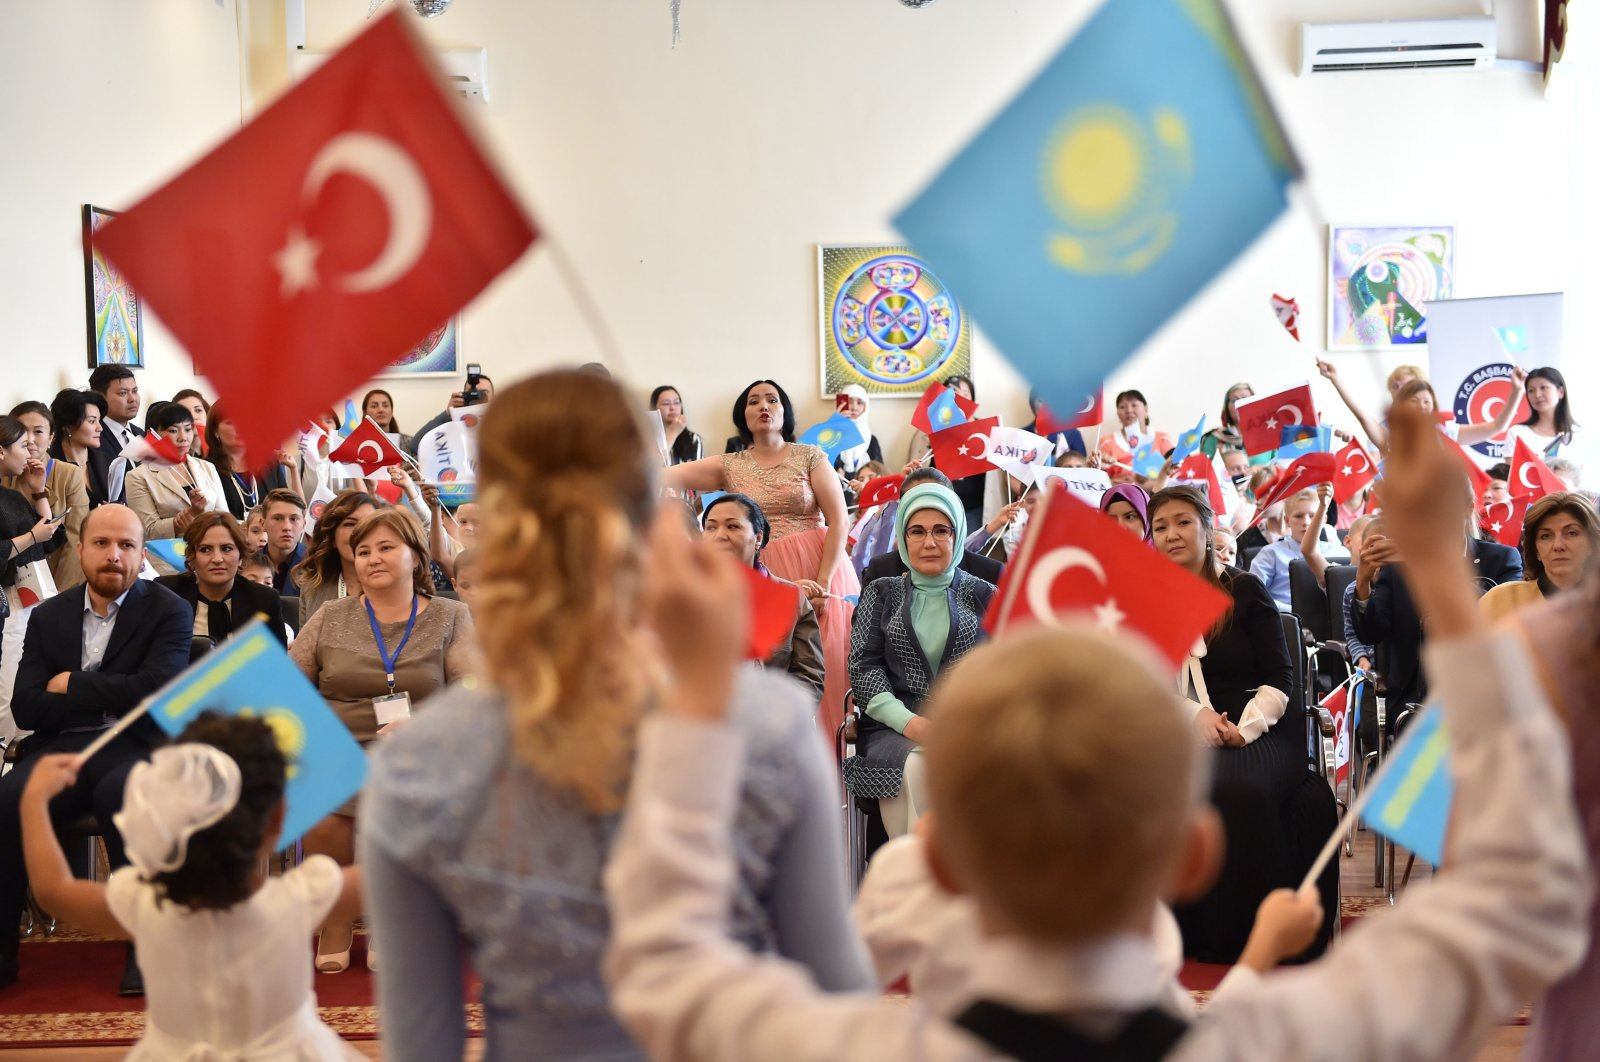 First lady Emine Erdoğan visits a child care center in Nur-Sultan, Kazakhstan, Sept. 9, 2017. (Sabah Photo)